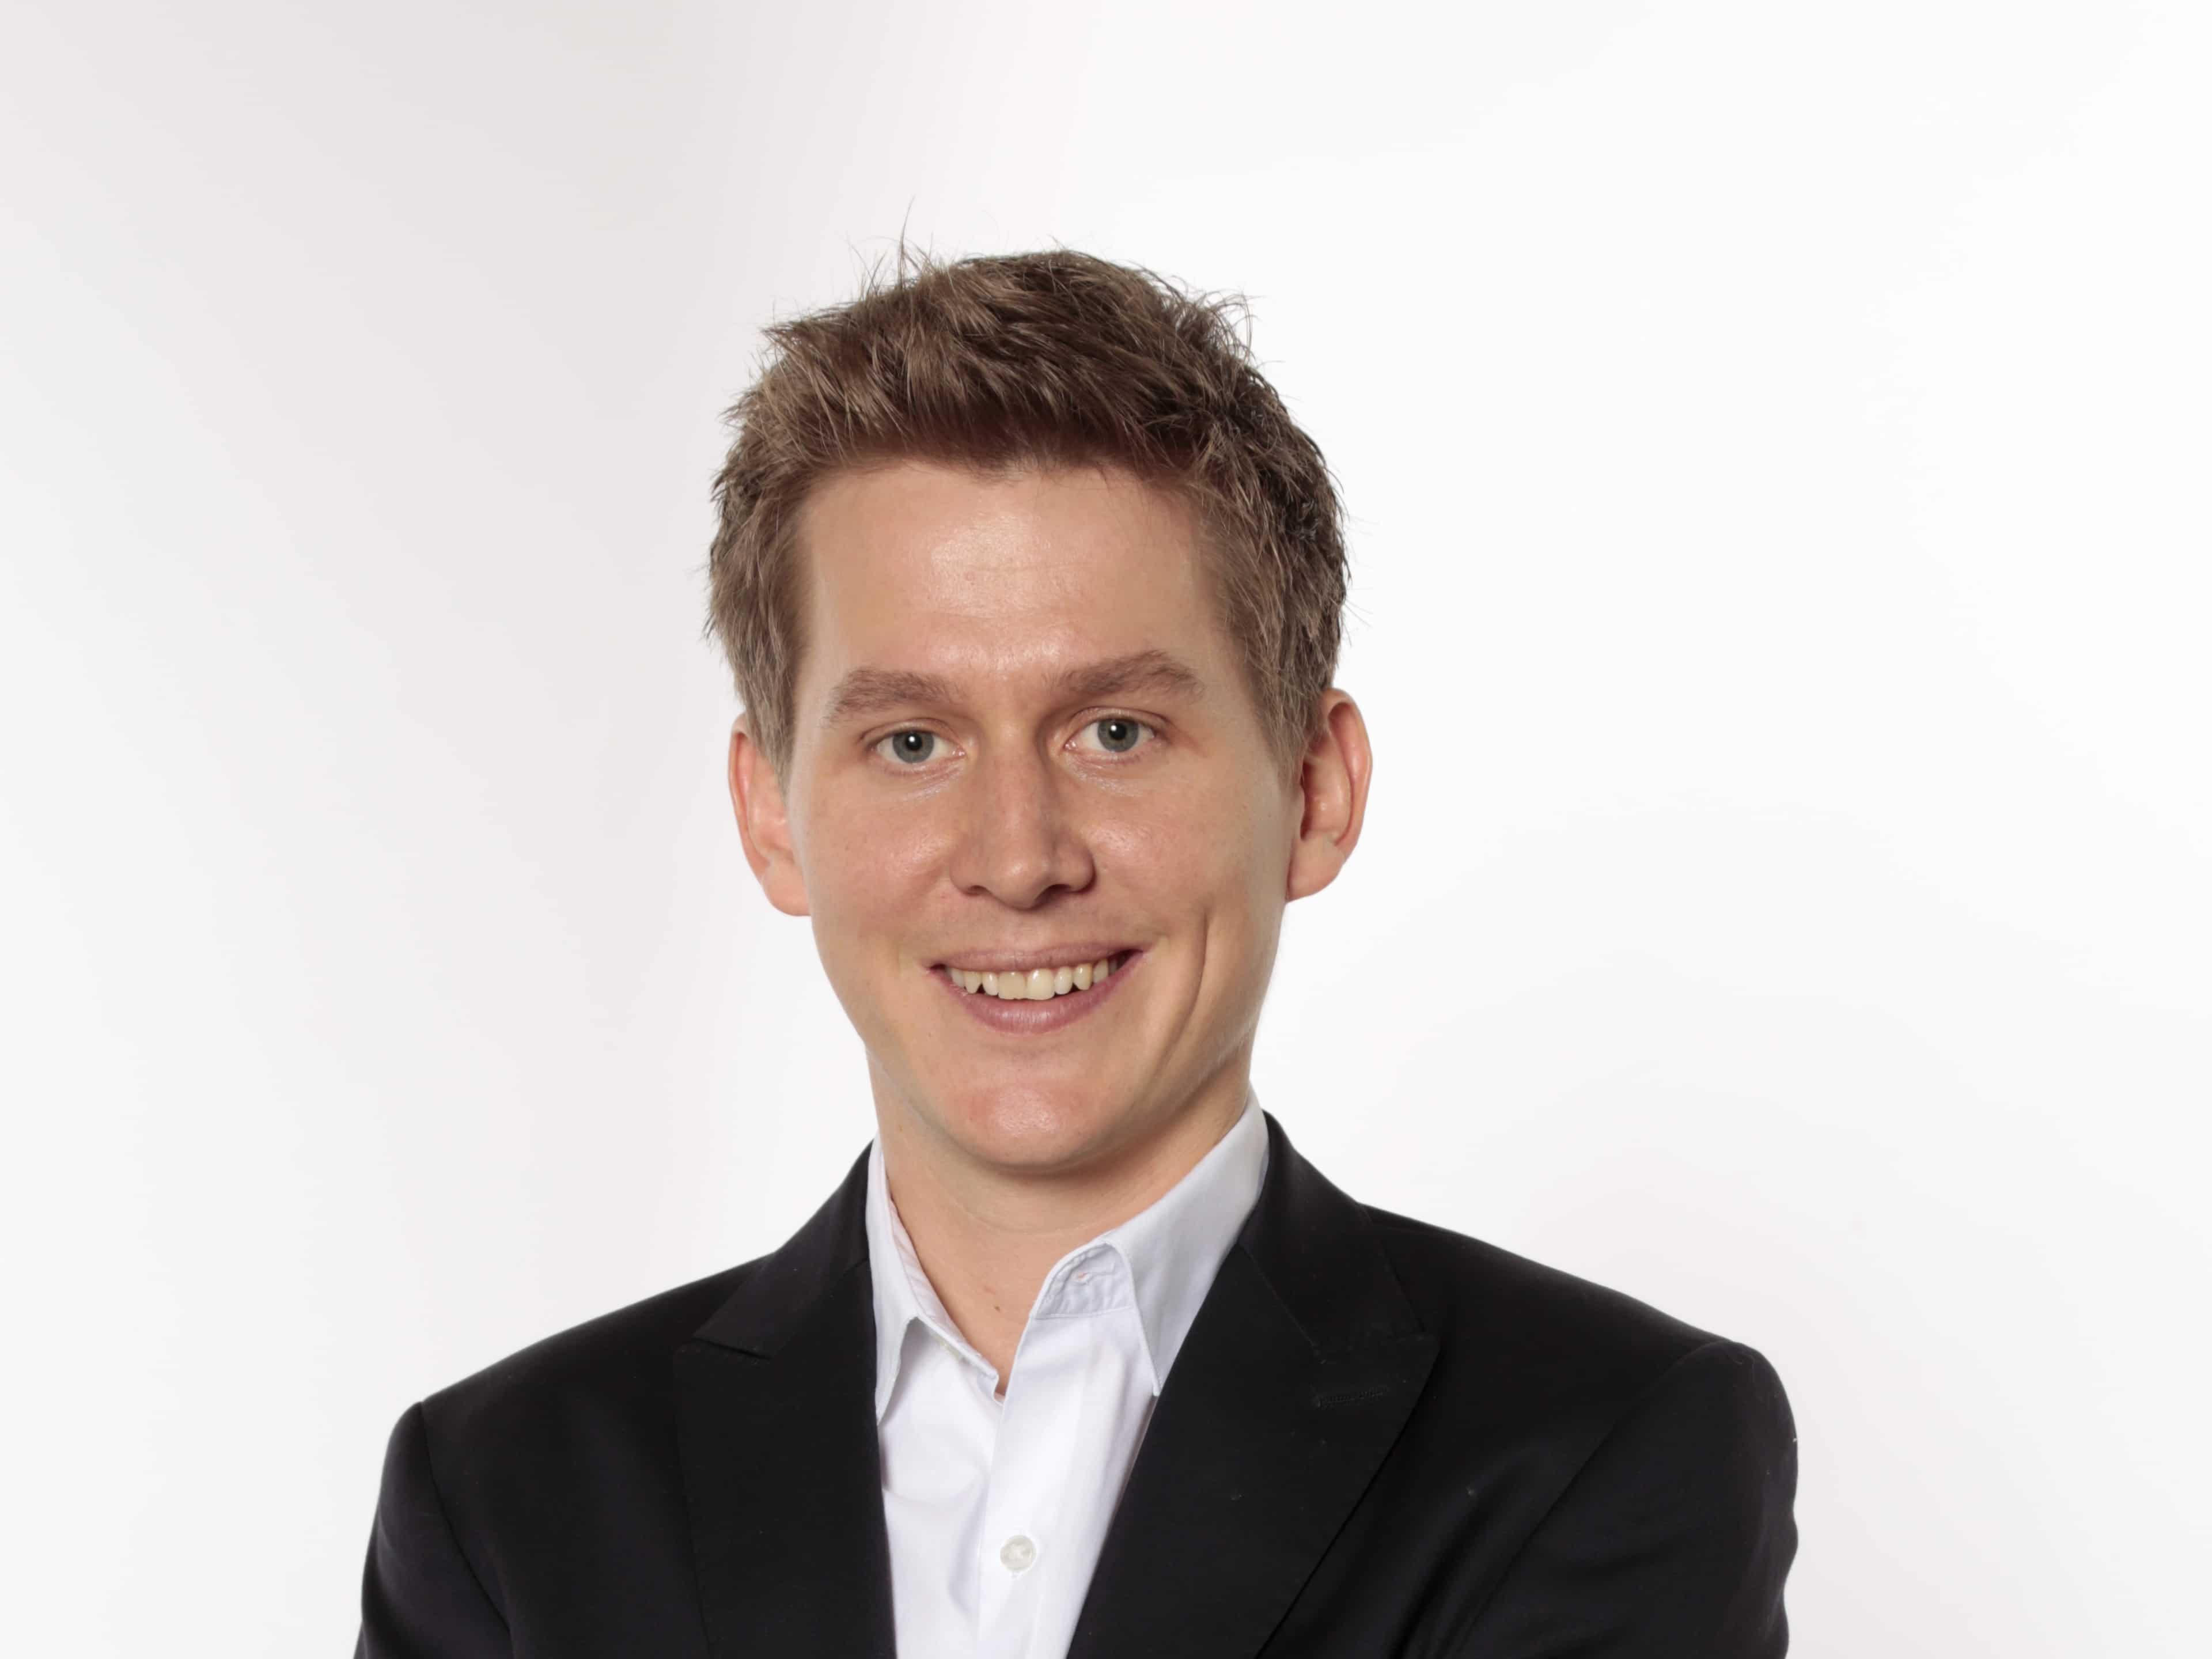 Neuer Referent bei Athenas: Christian Hirsig